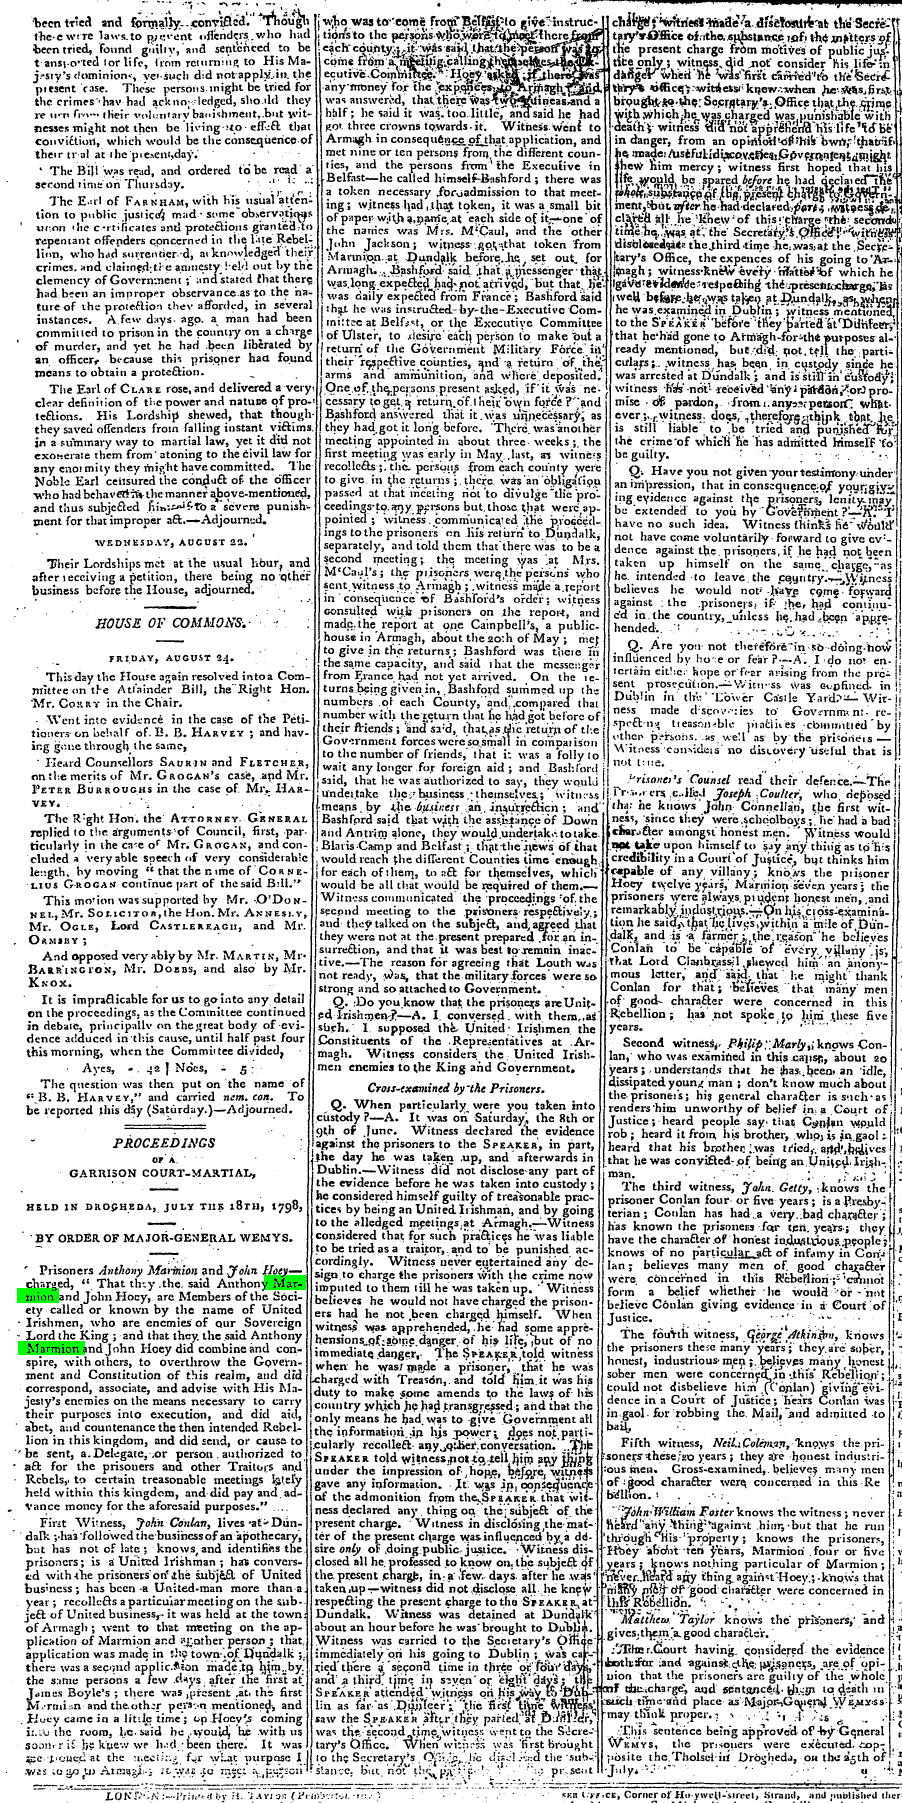 1798+rebellion+facts